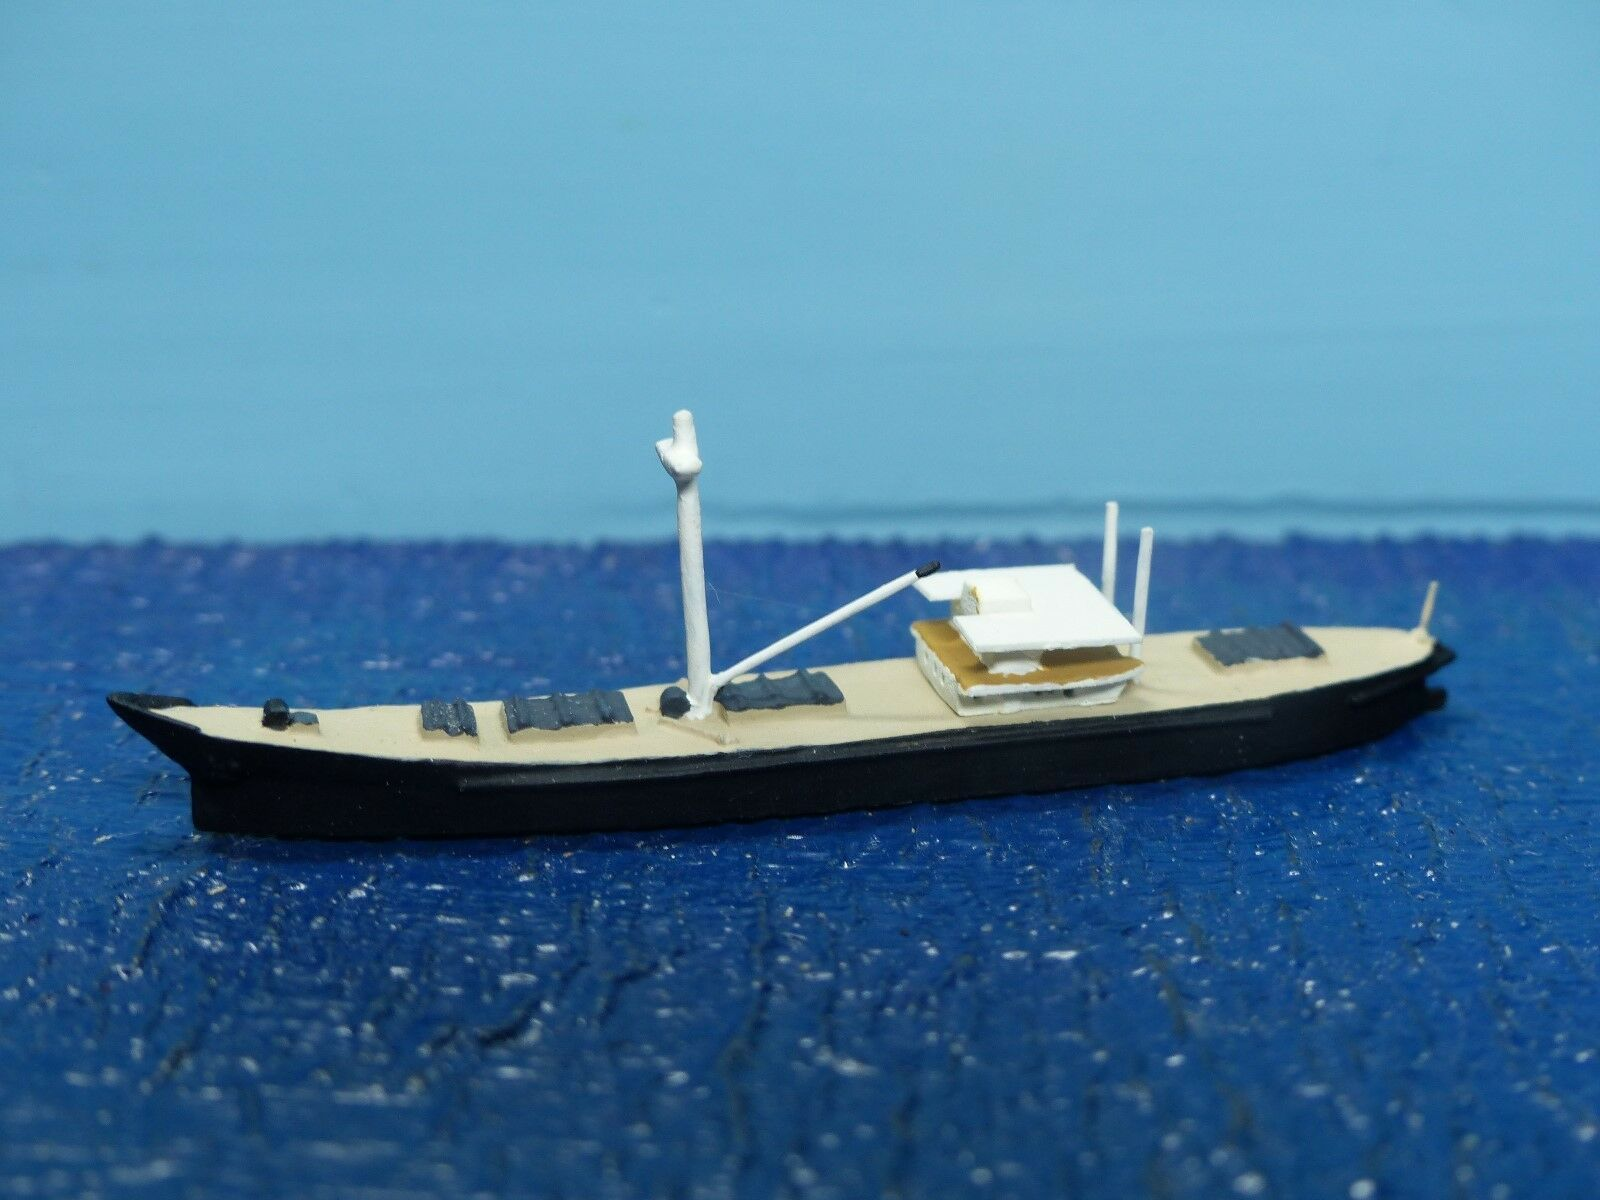 Vagel Grip navire 1 1250 KUB. plus facilement  Playitas  VG 25 A